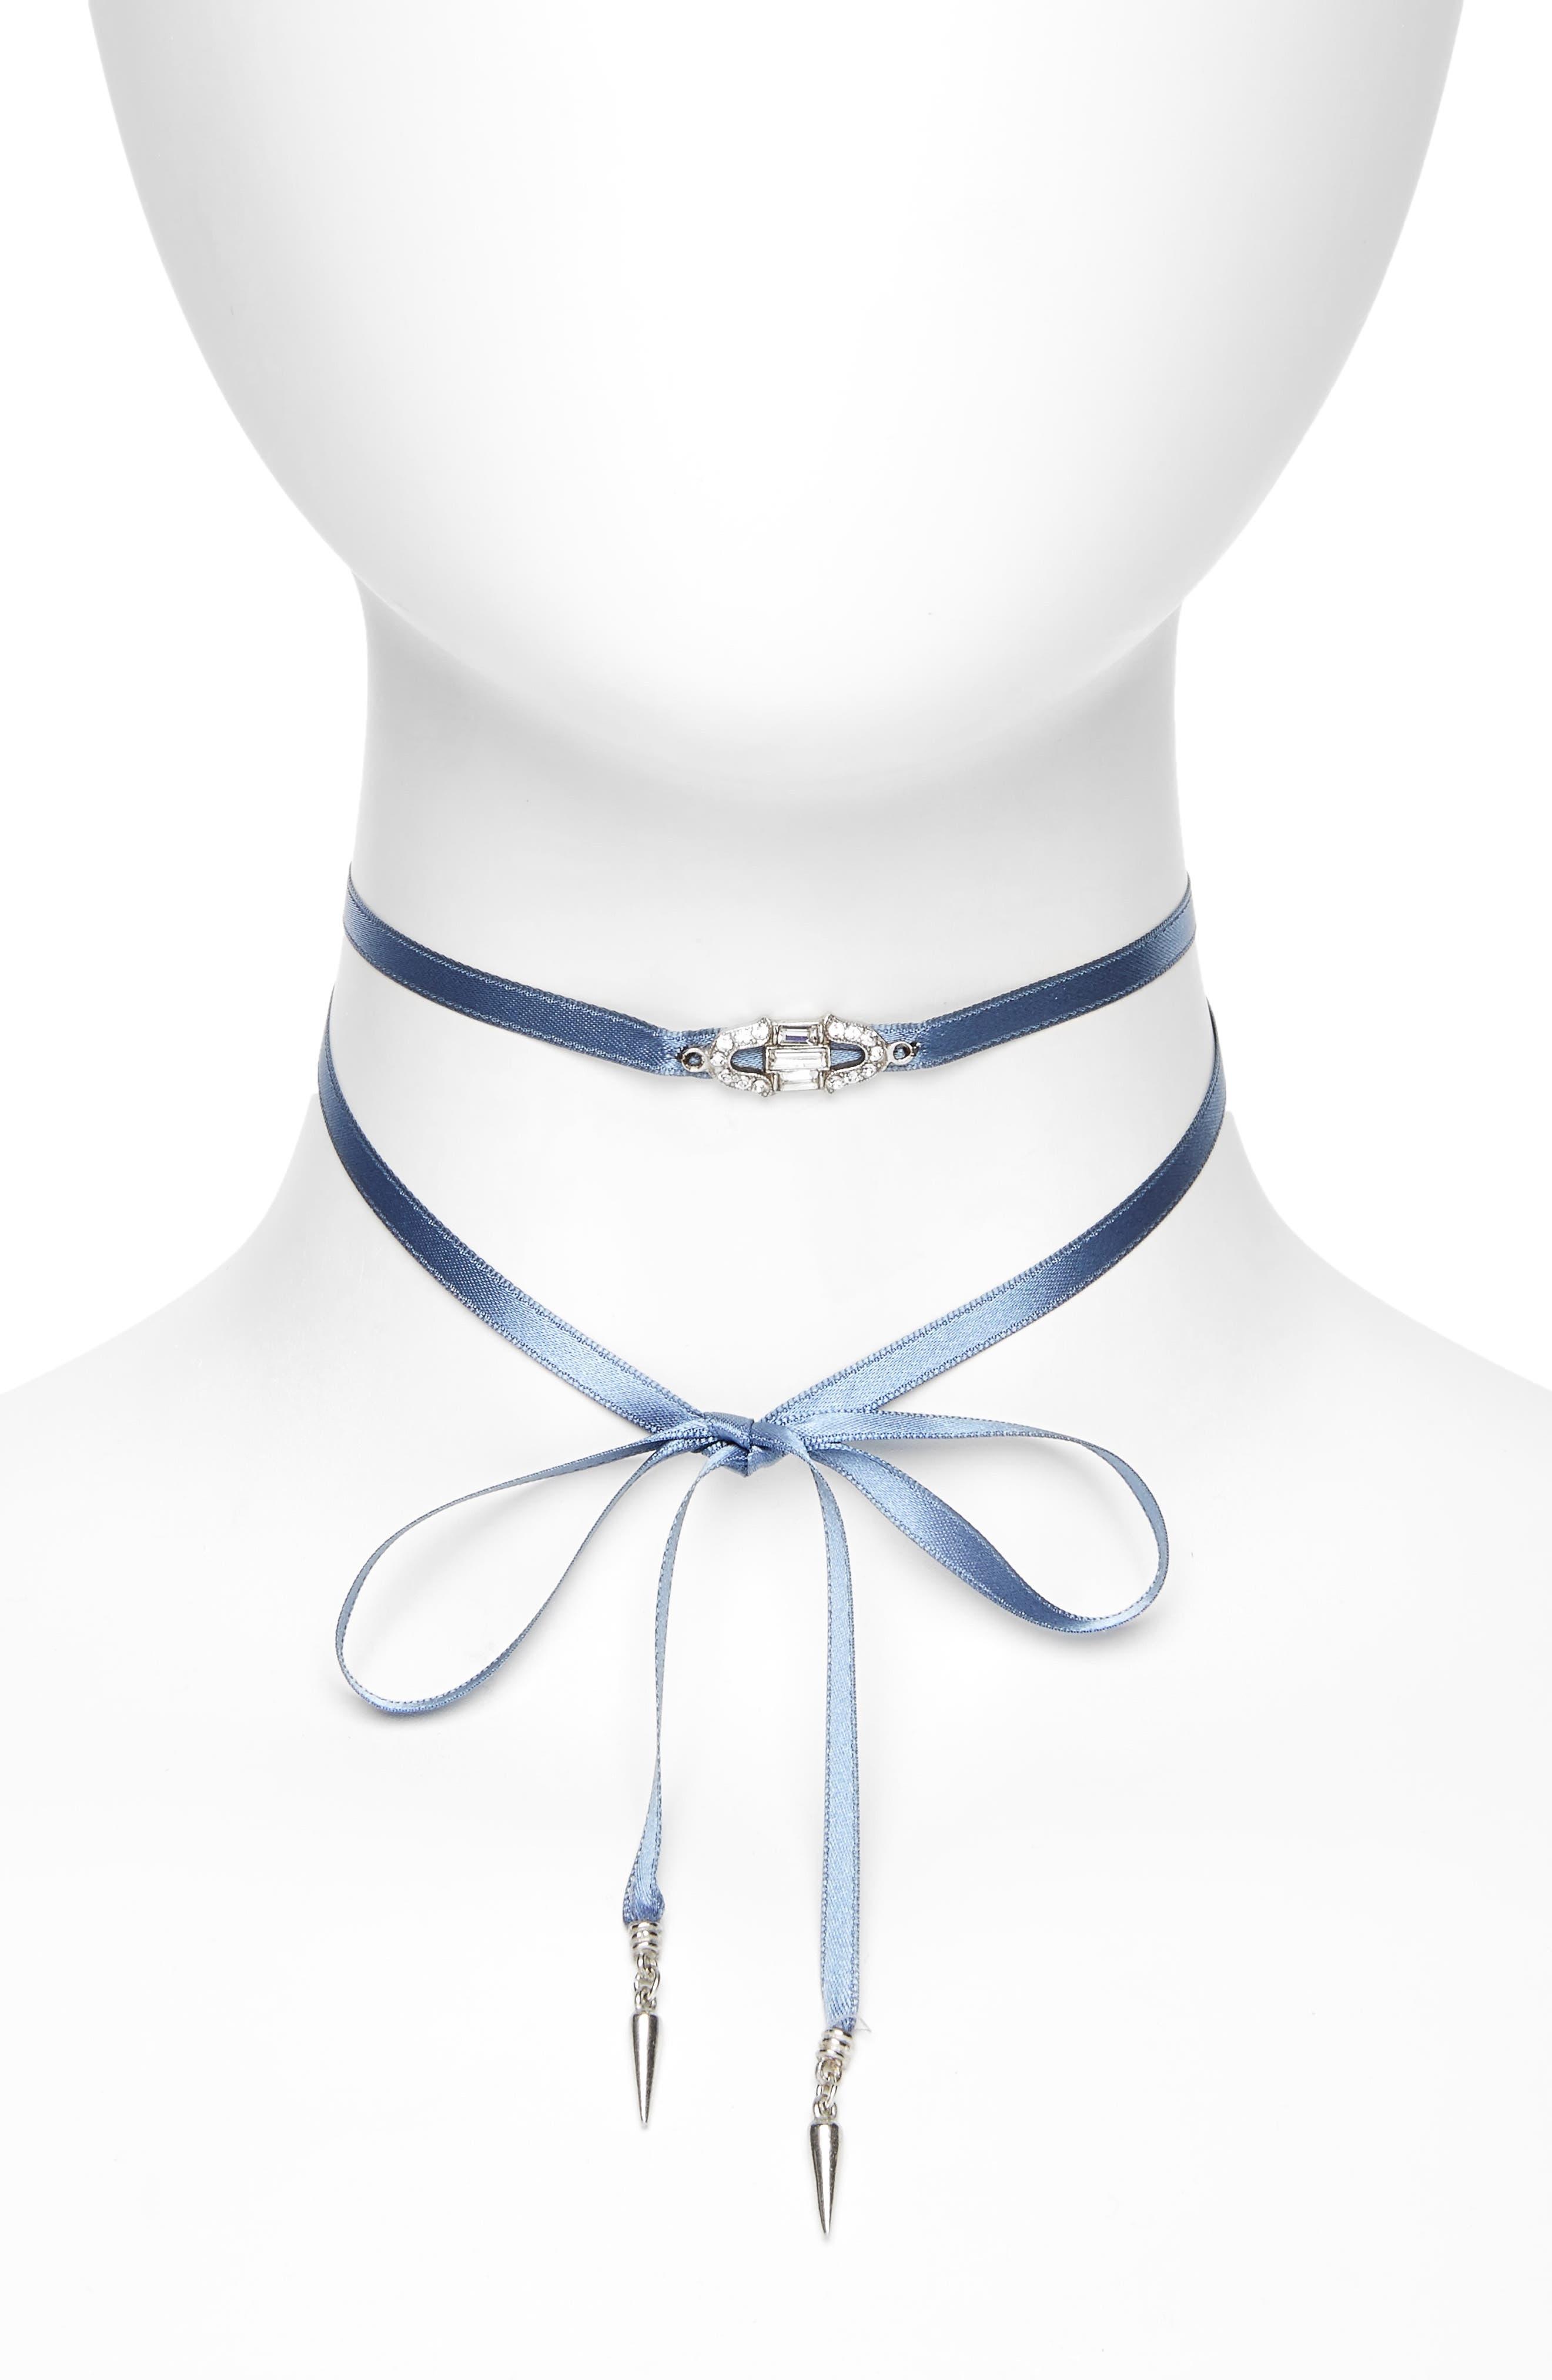 BEN-AMUN Ben-Amur Deco Wrap Choker Necklace